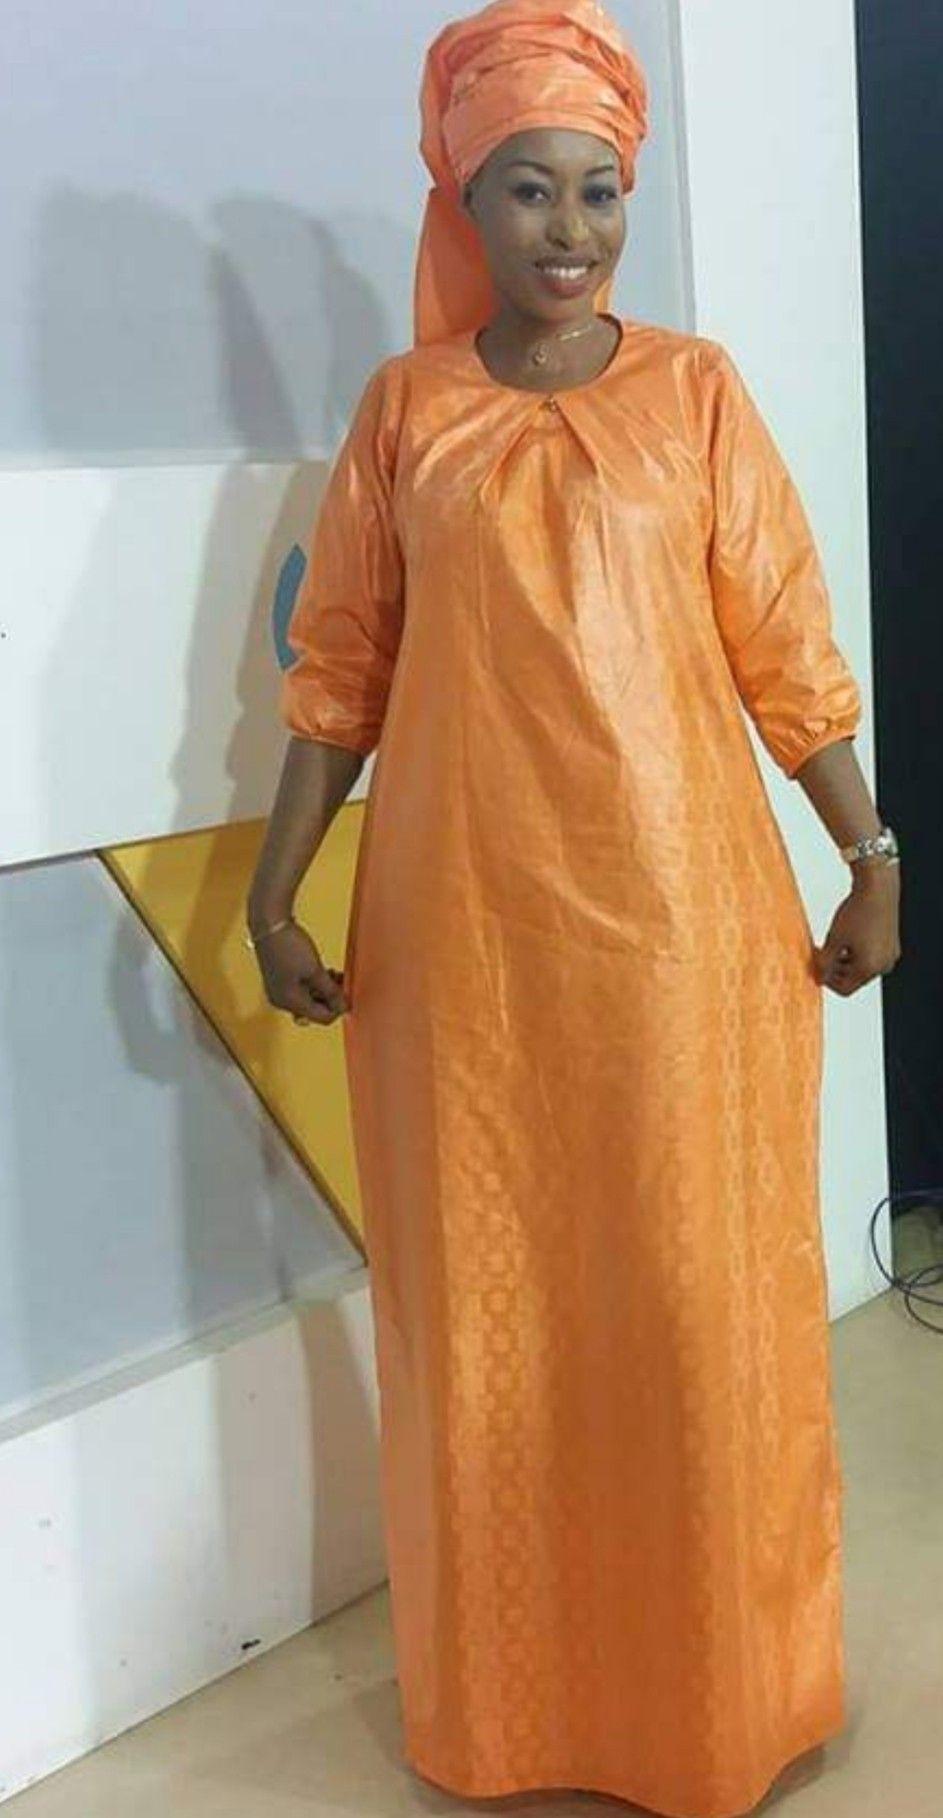 robe bazin simple | Mode africaine robe longue, Mode africaine robe, Robe africaine tendance